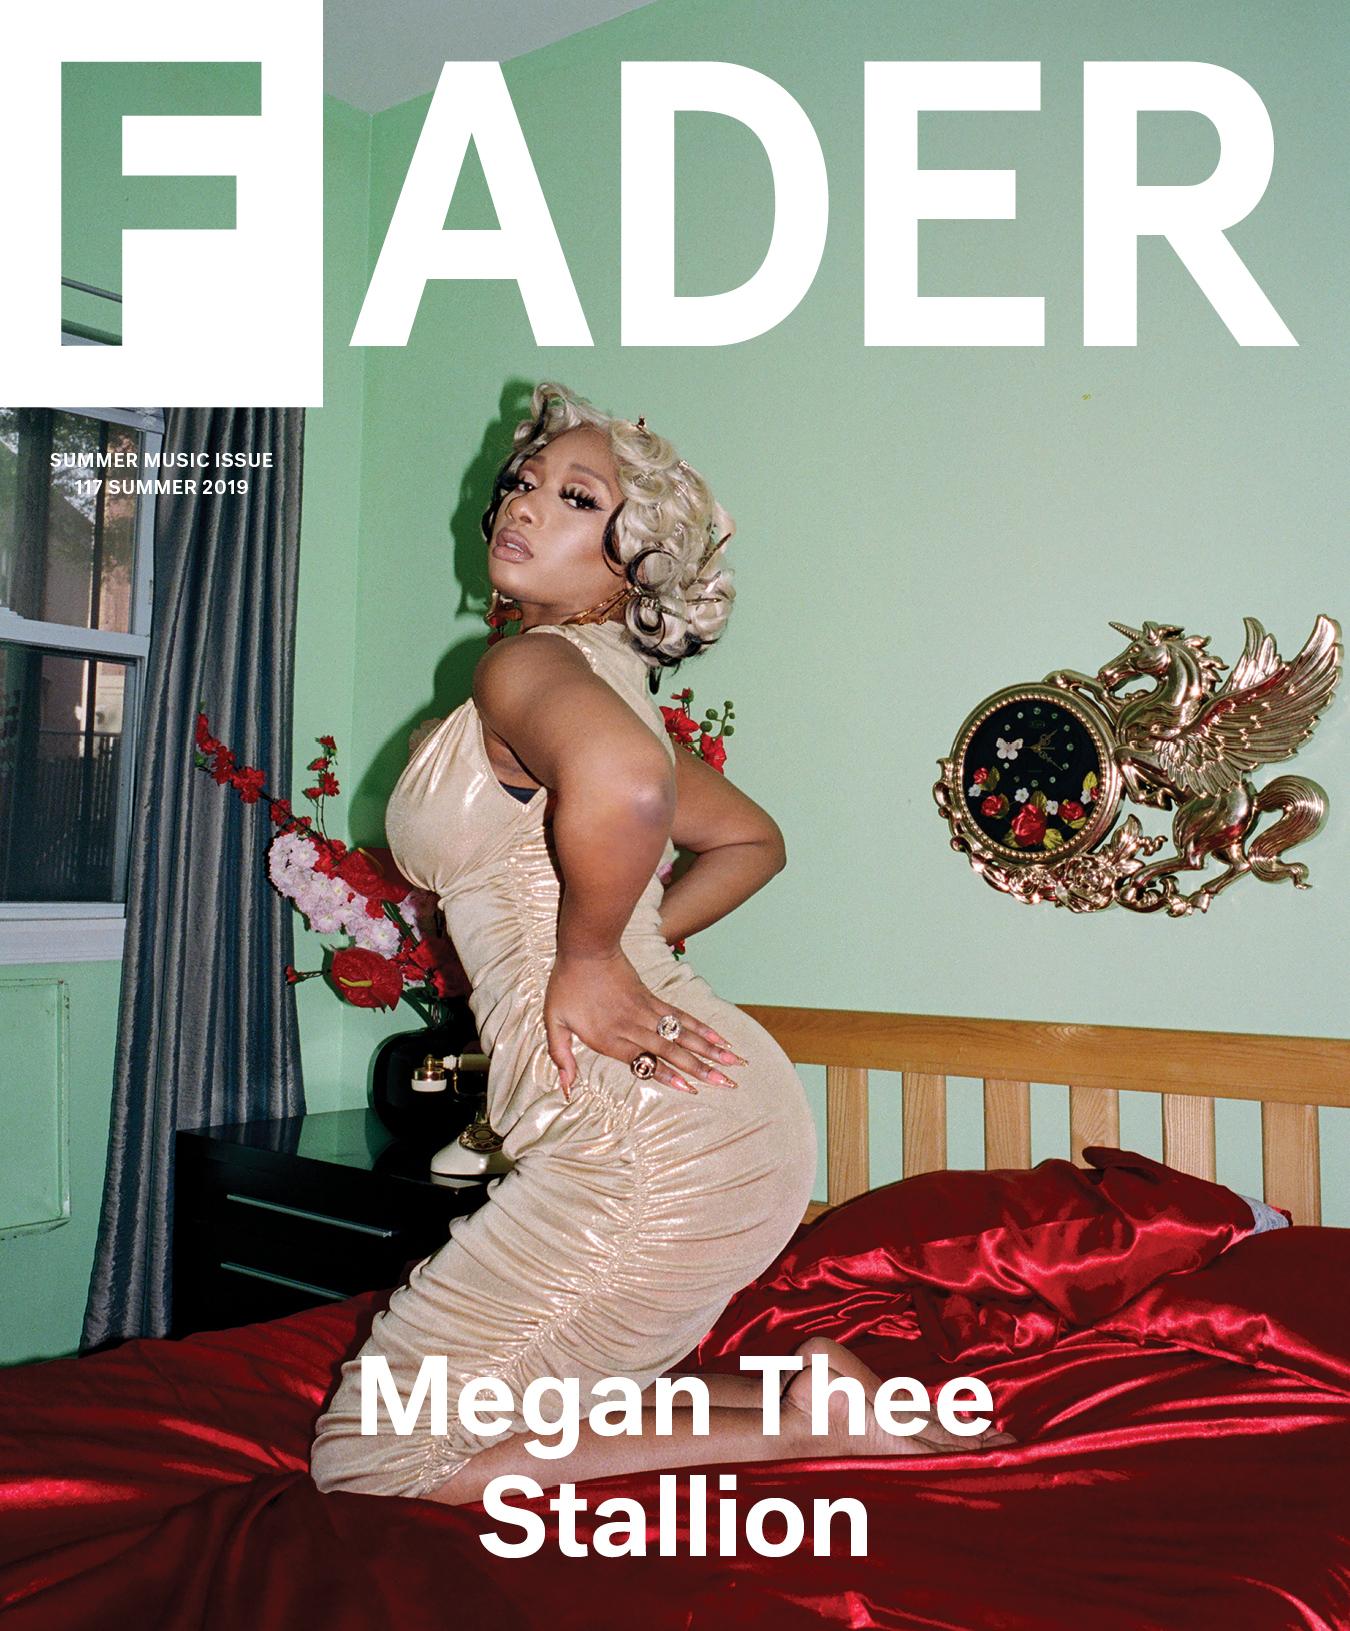 Megan Thee Stallion - The FADER